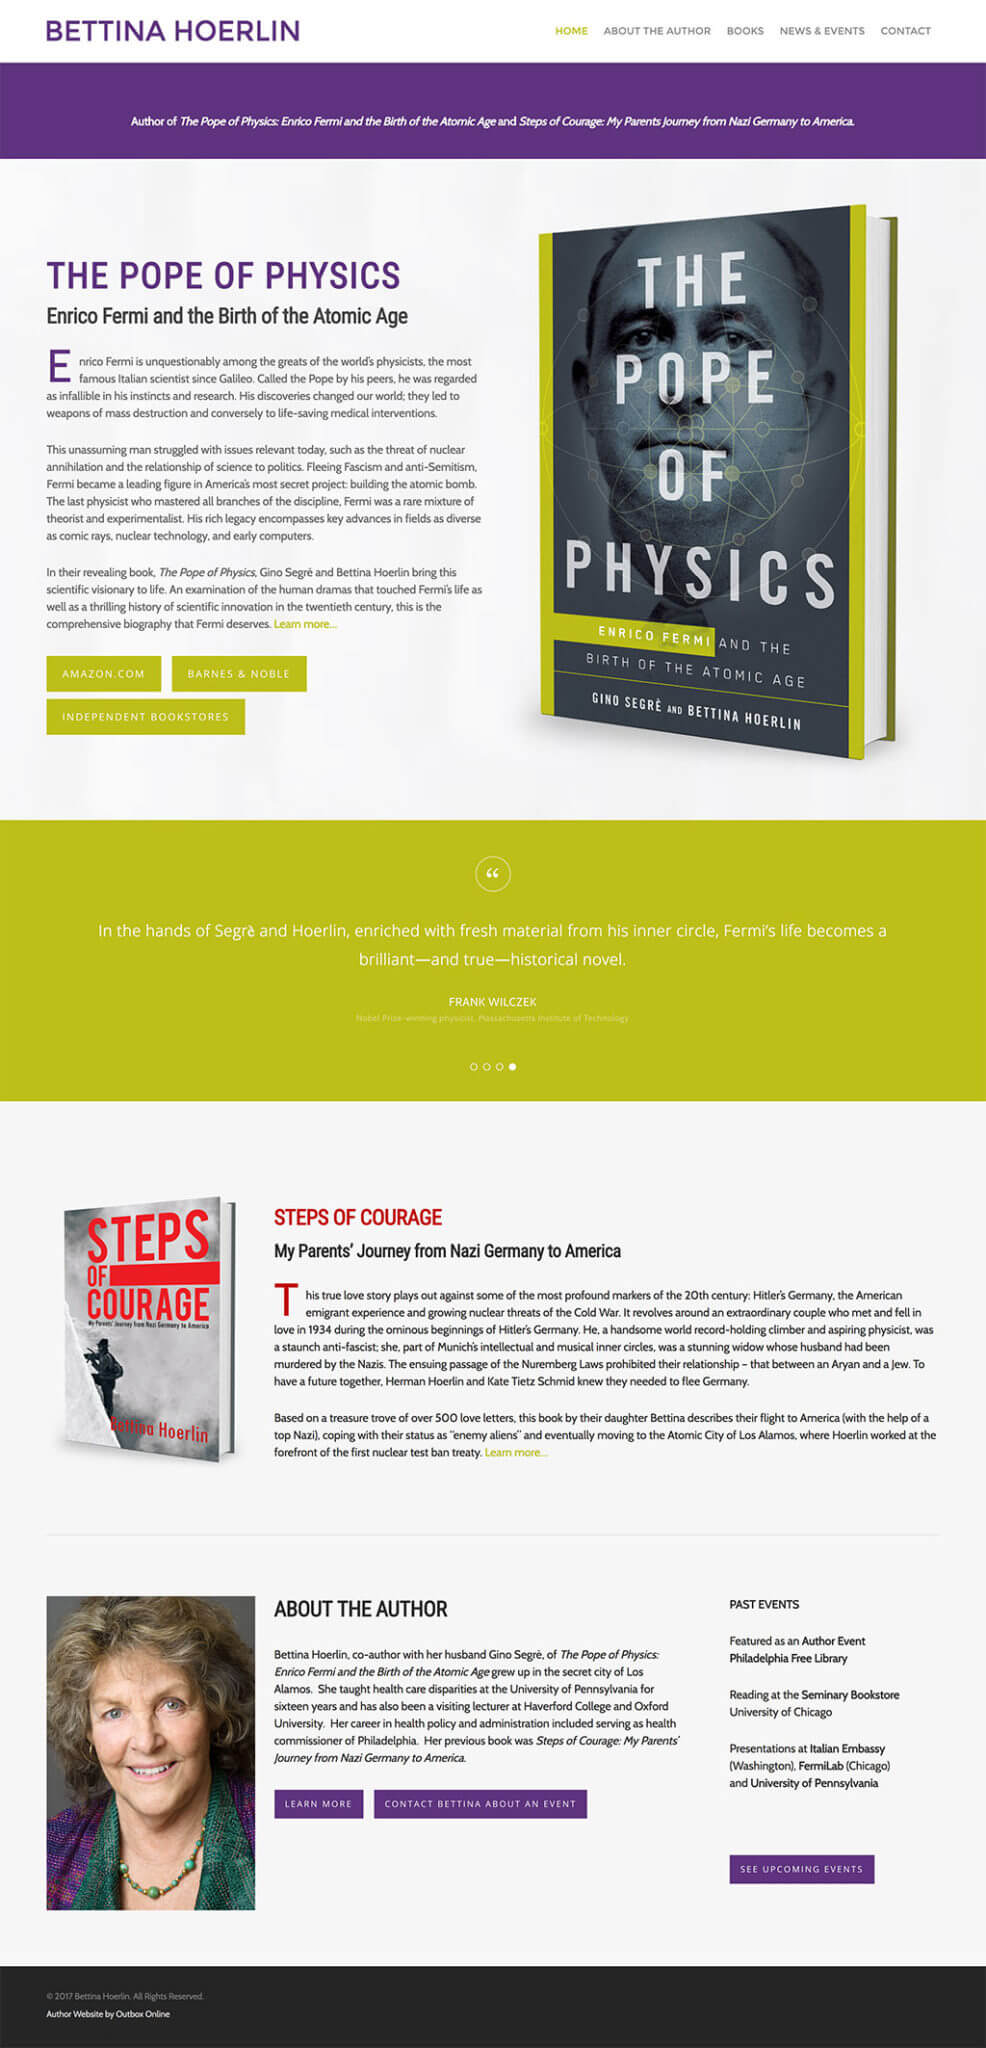 Author Website Design for Bettina Hoerlin